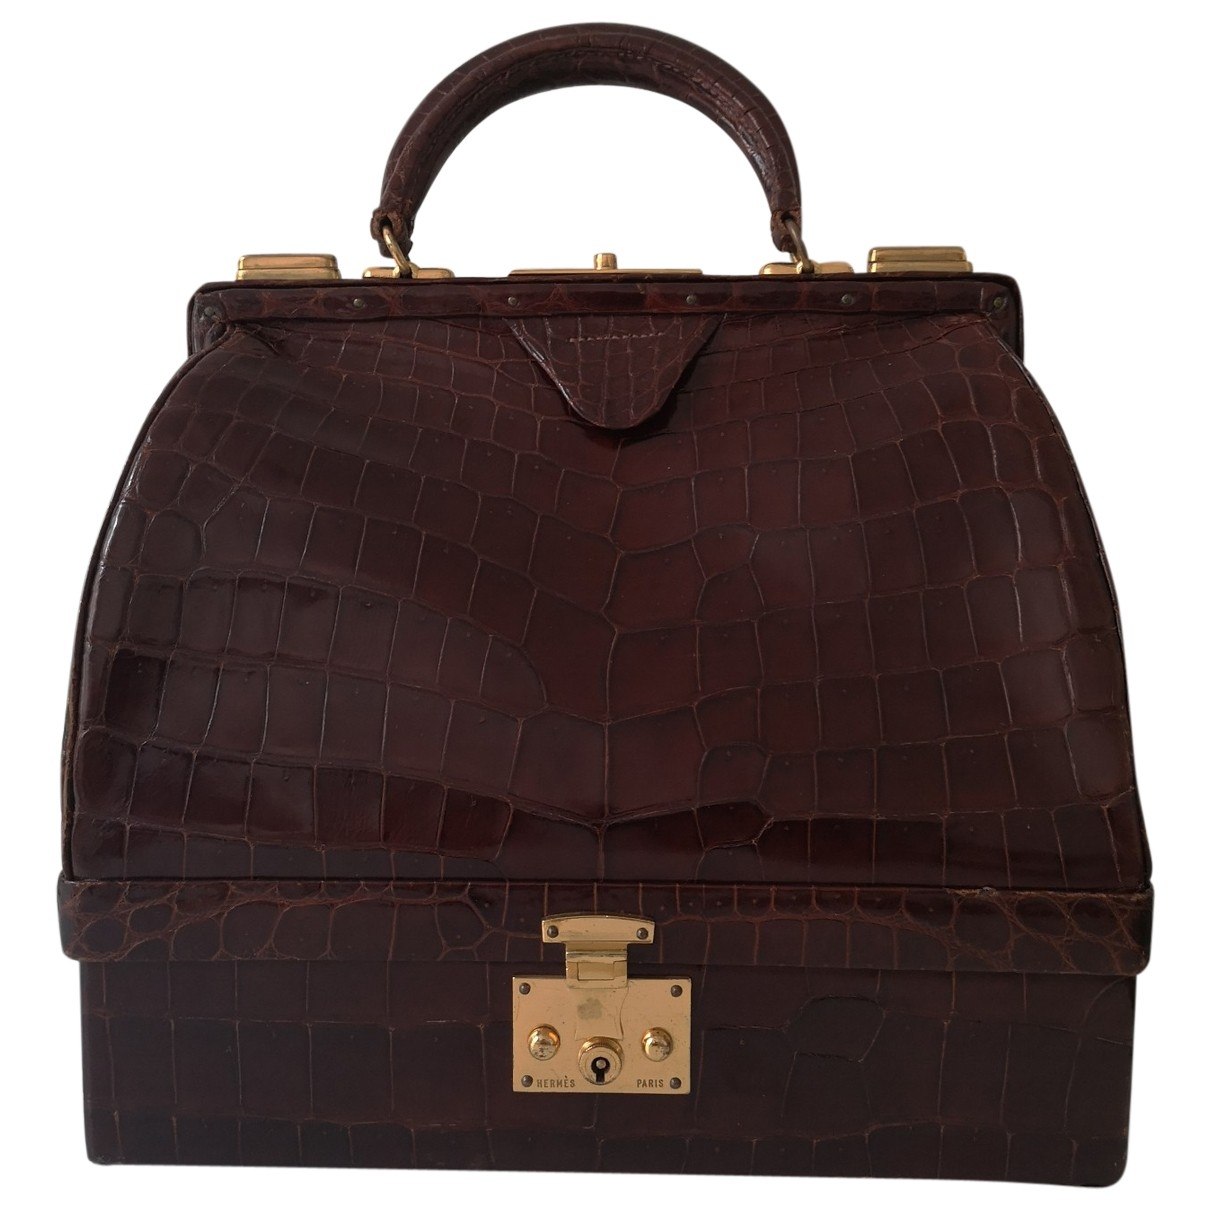 Hermès Malette Brown Crocodile handbag for Women \N